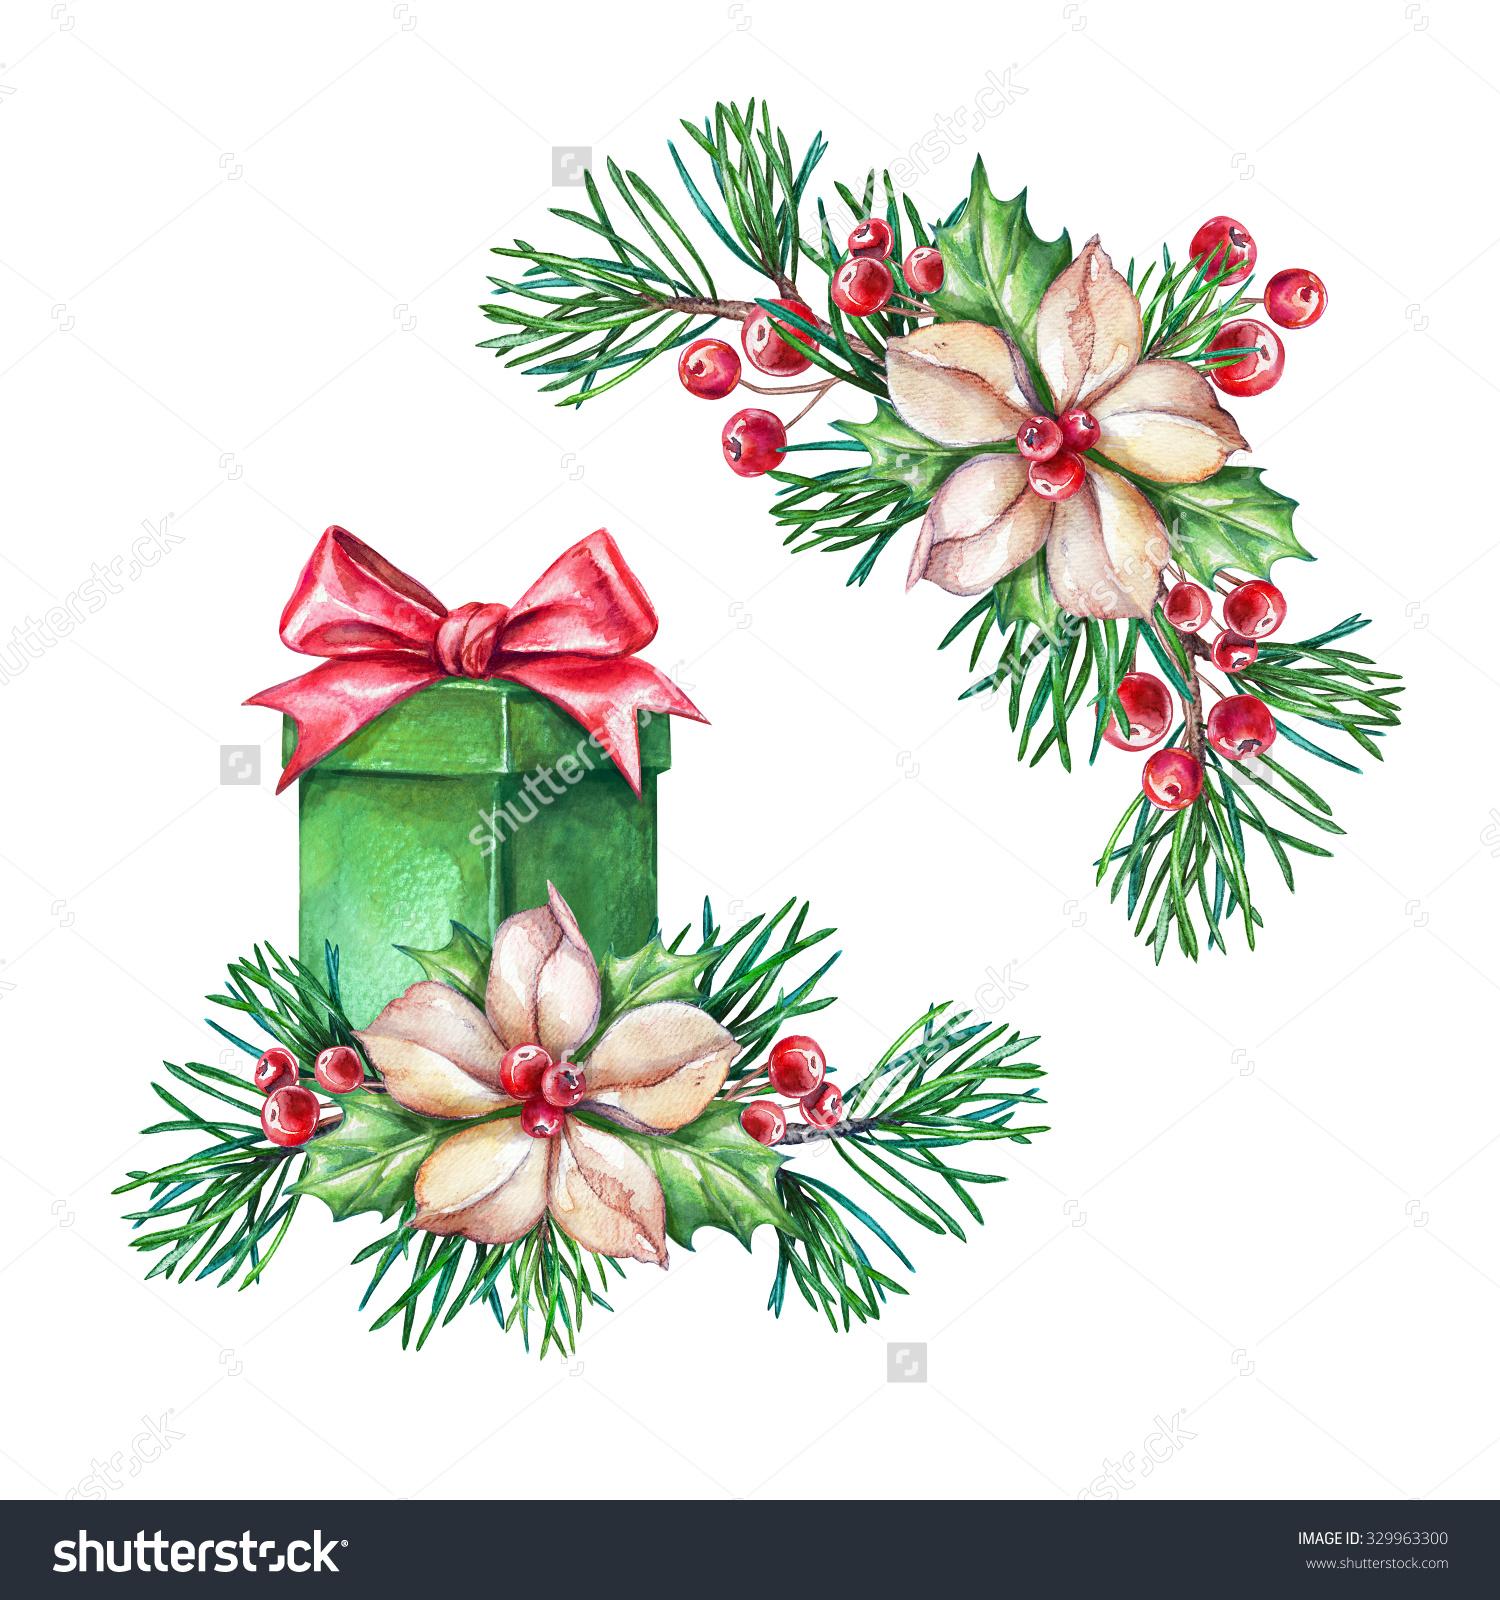 Christmas Gift, Coniferous Twigs, Poinsettia Flowers, Design.